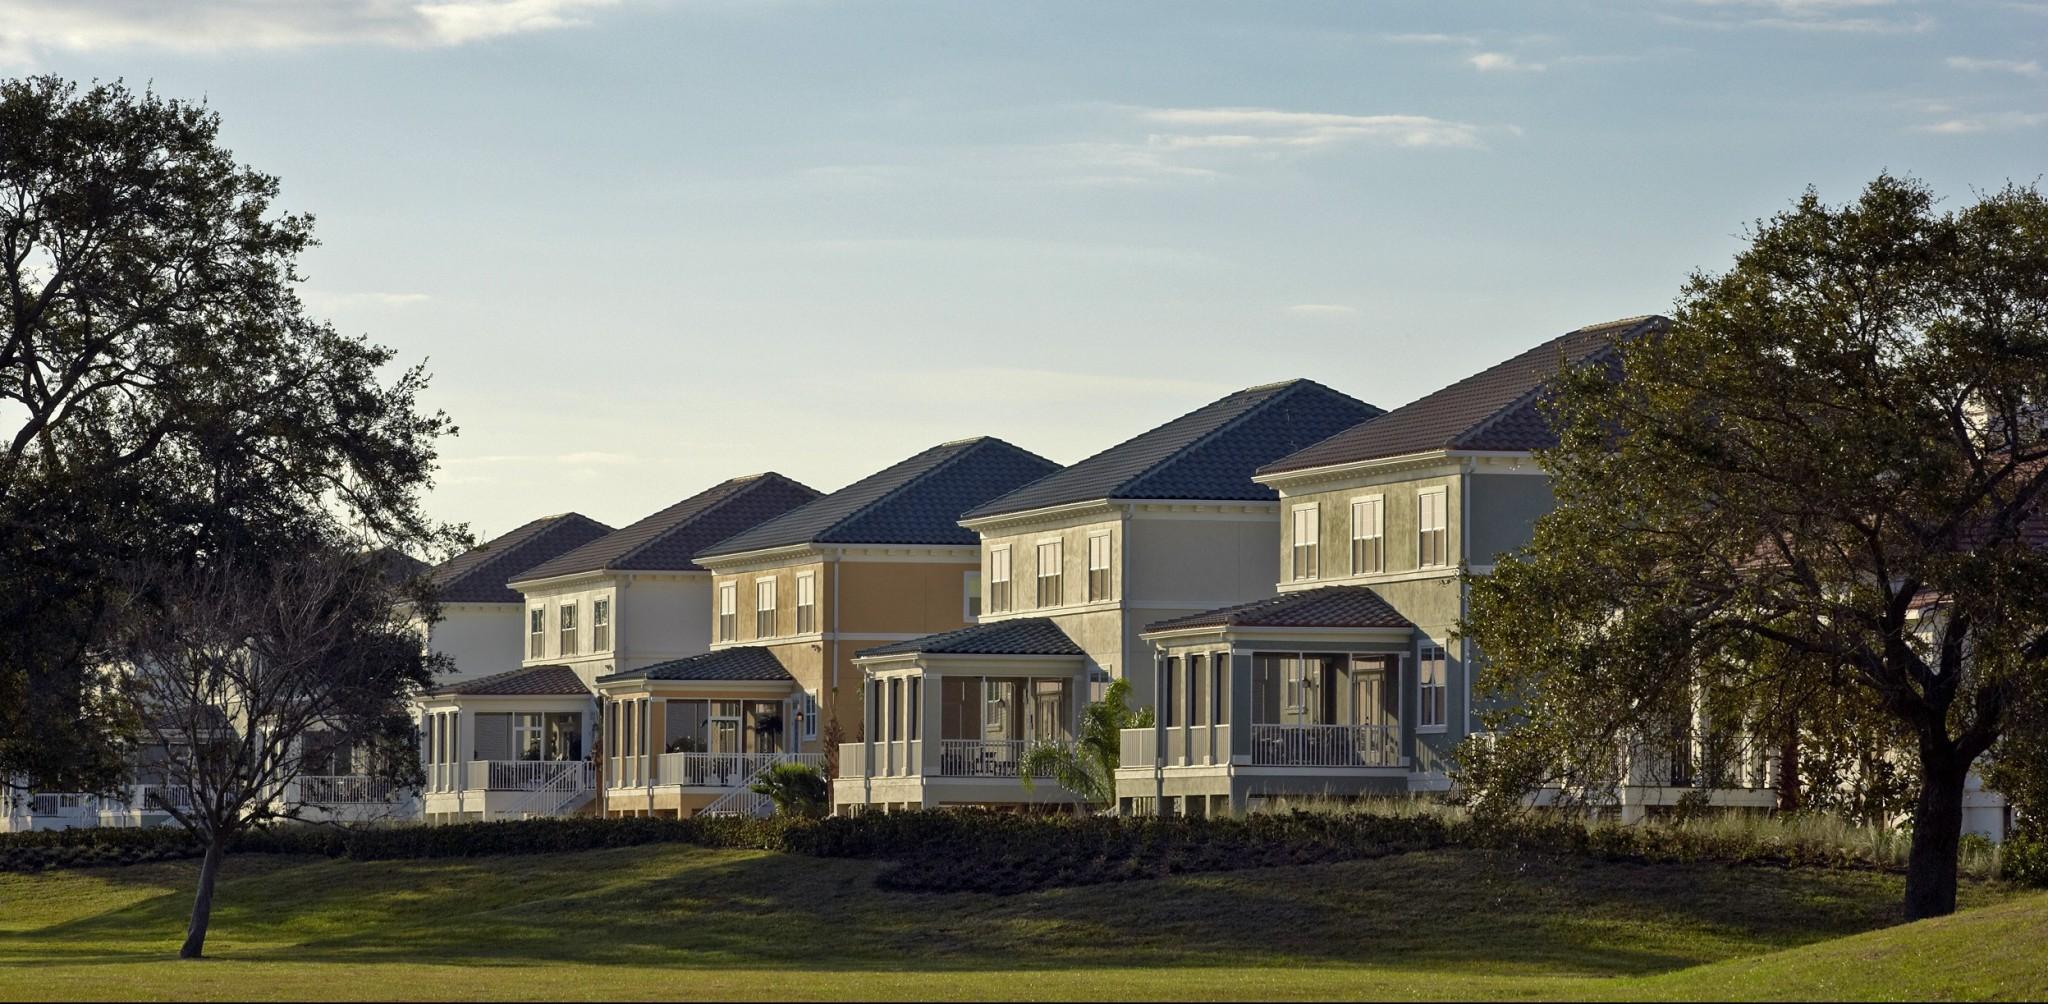 Harbor-Bay-homes.jpg